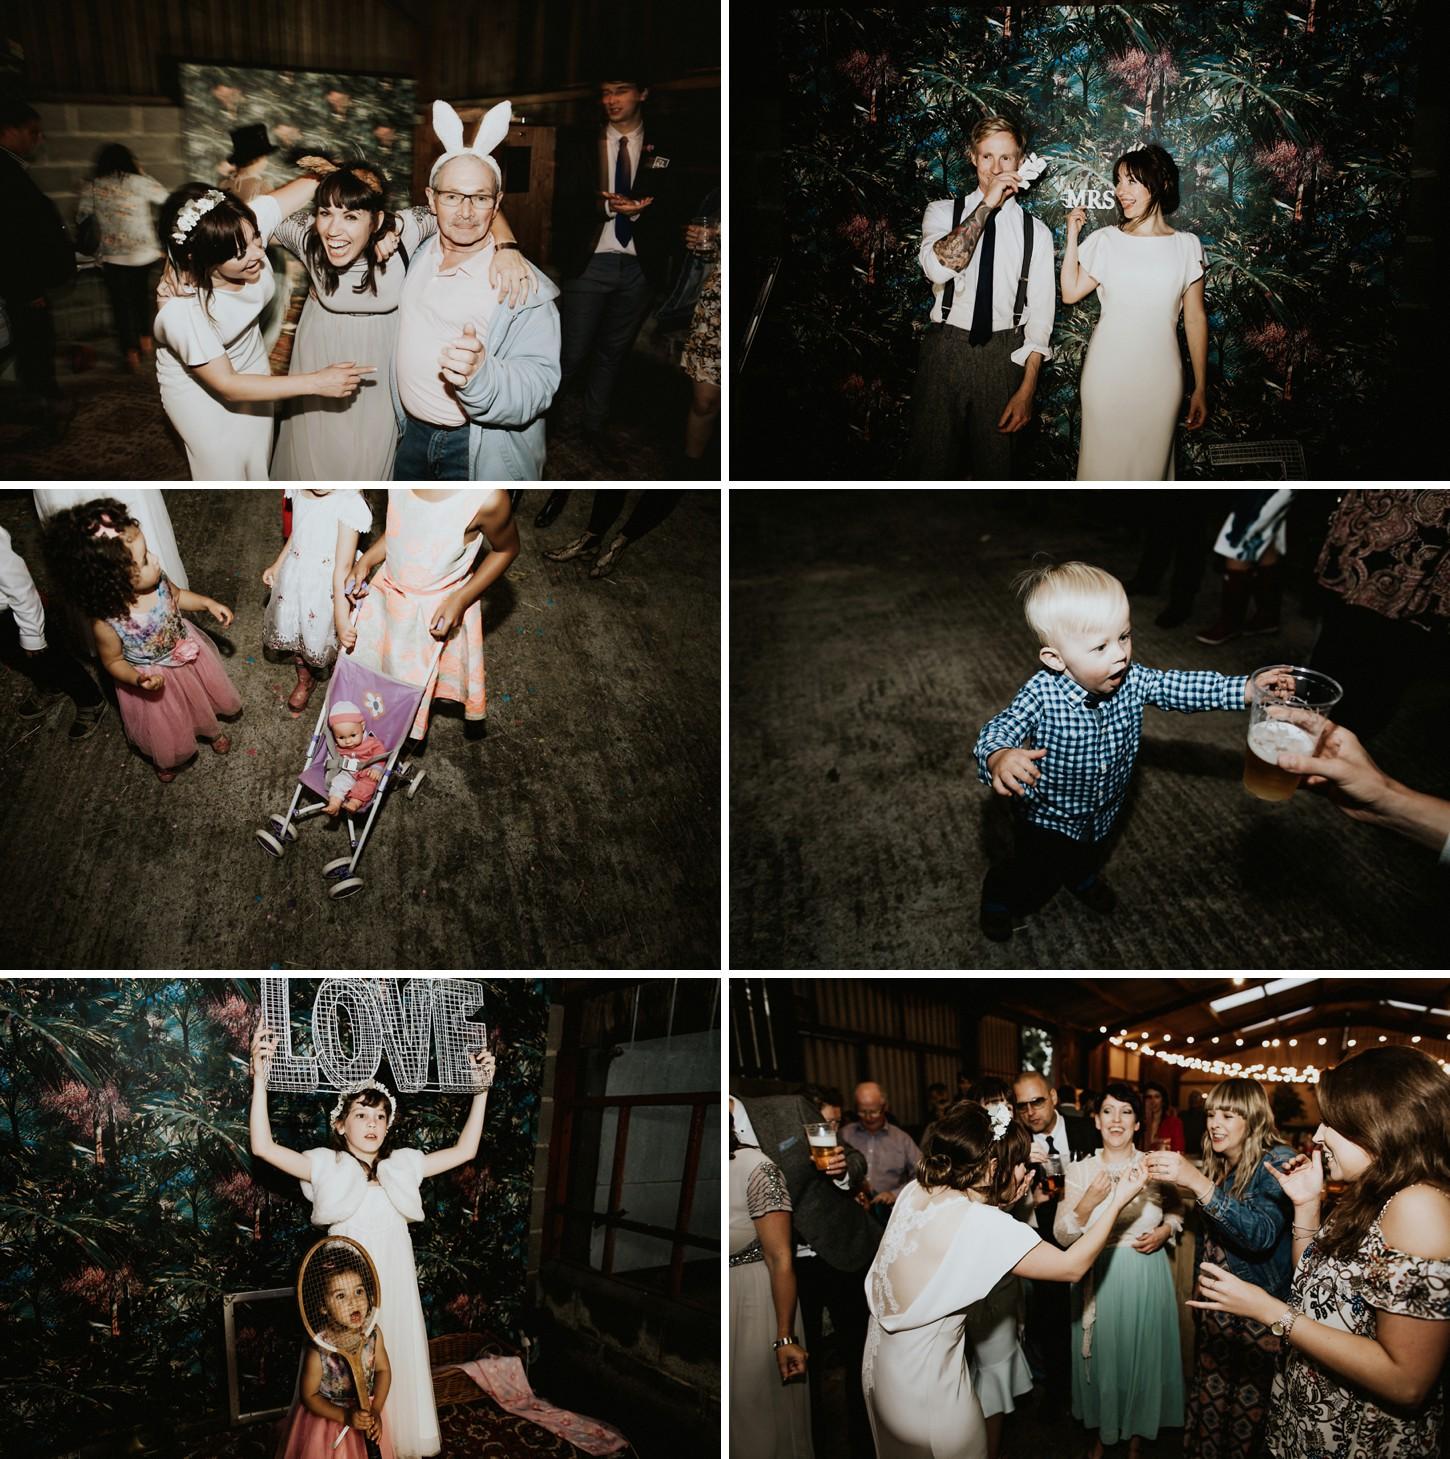 Dolau-Sheep-Farm-Wedding-Wales-United-Kingdom-074